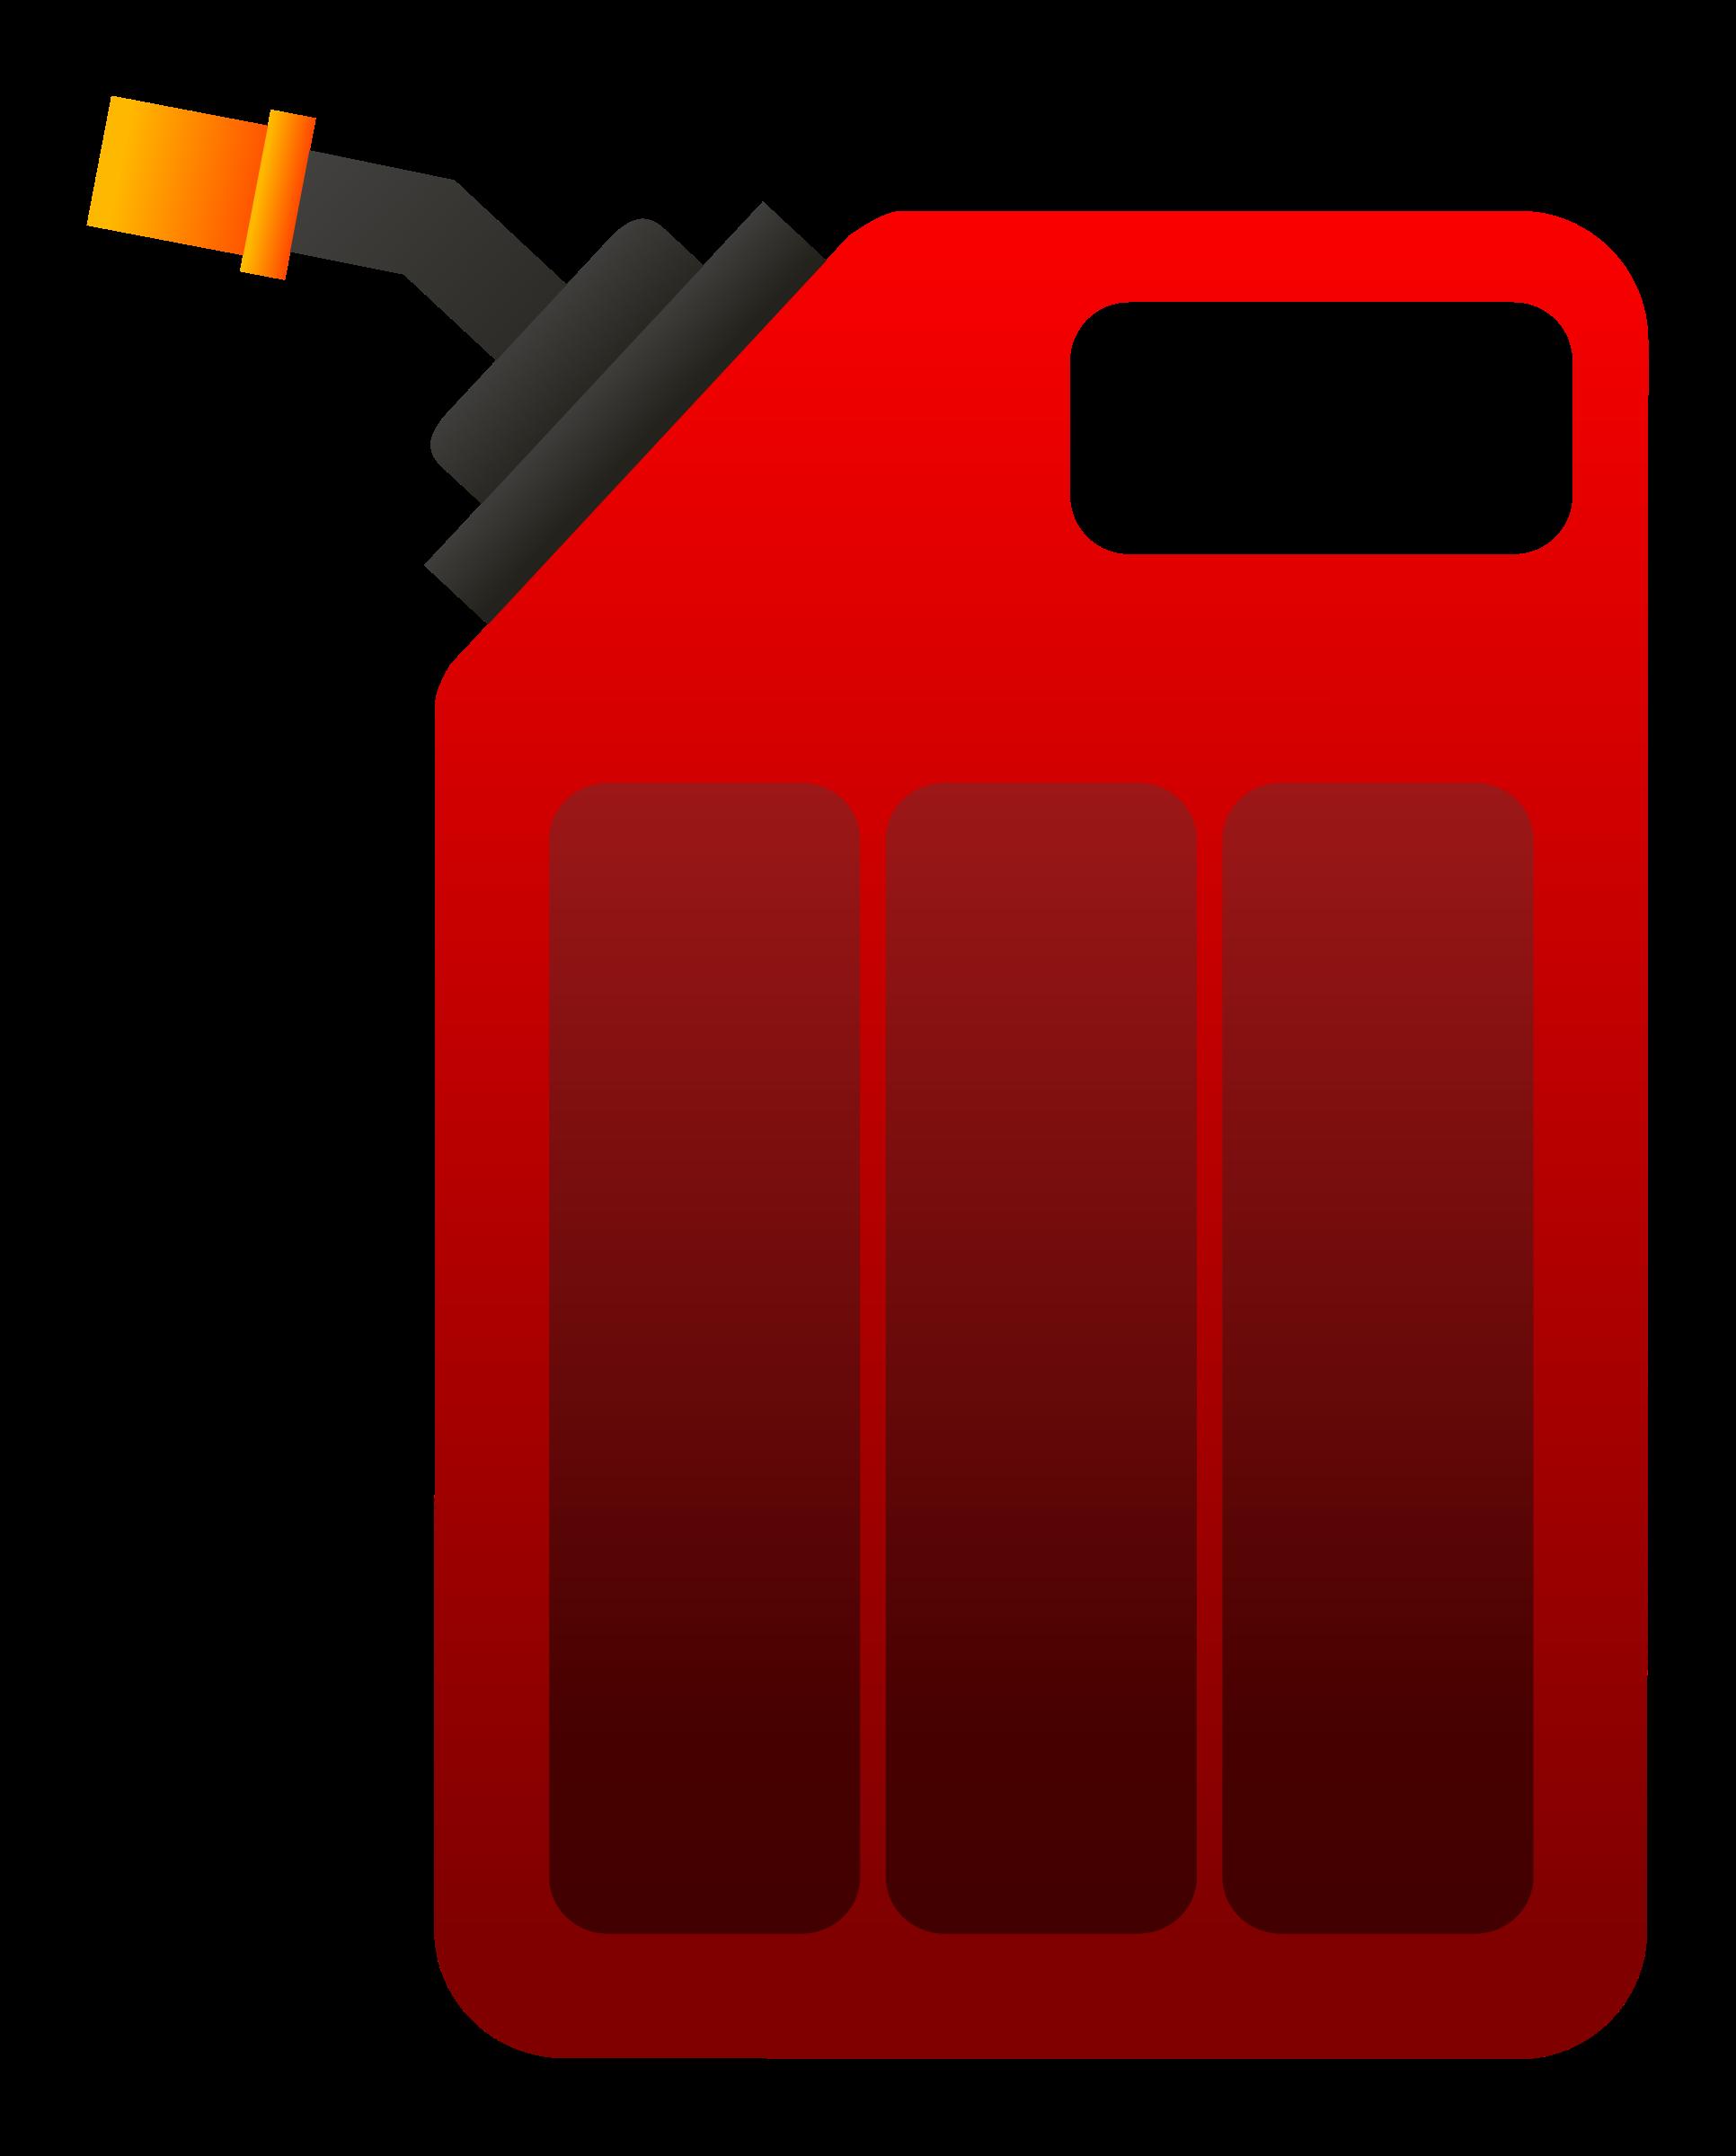 Fuel Petrol Jerrycan Png Image Petrol Png Images Fuel